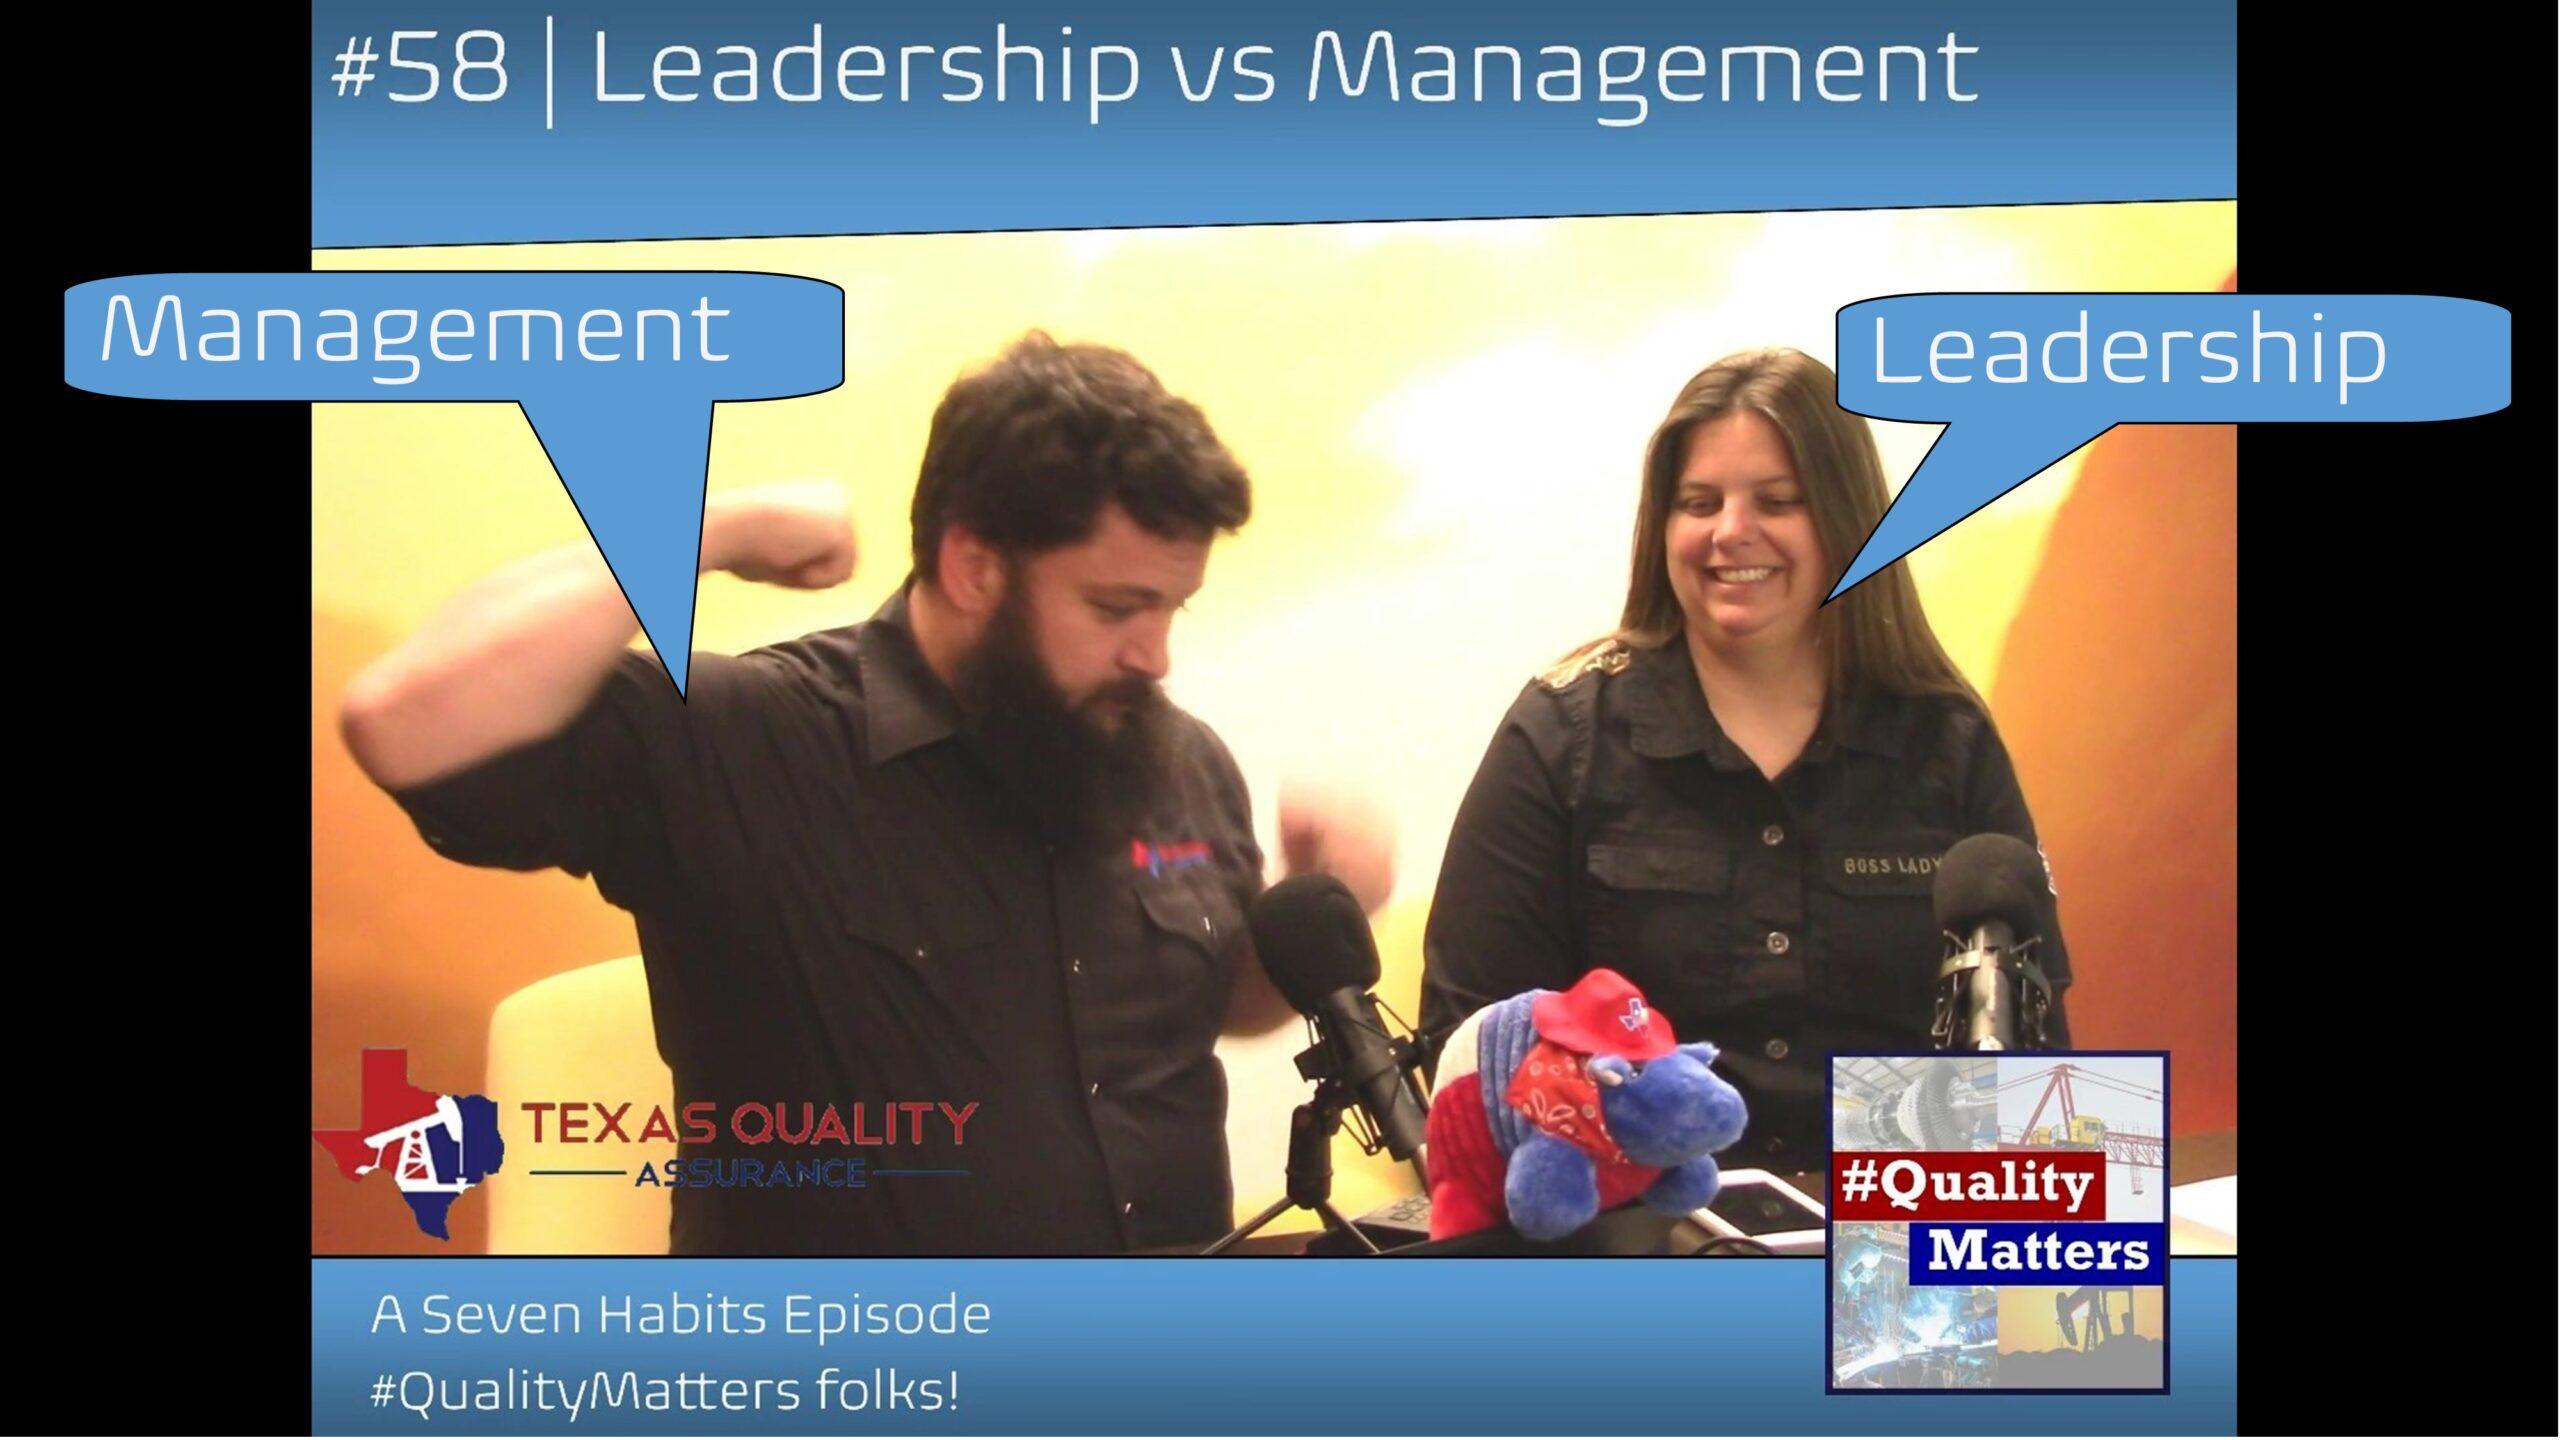 Leadership vs Management - Seven Habits